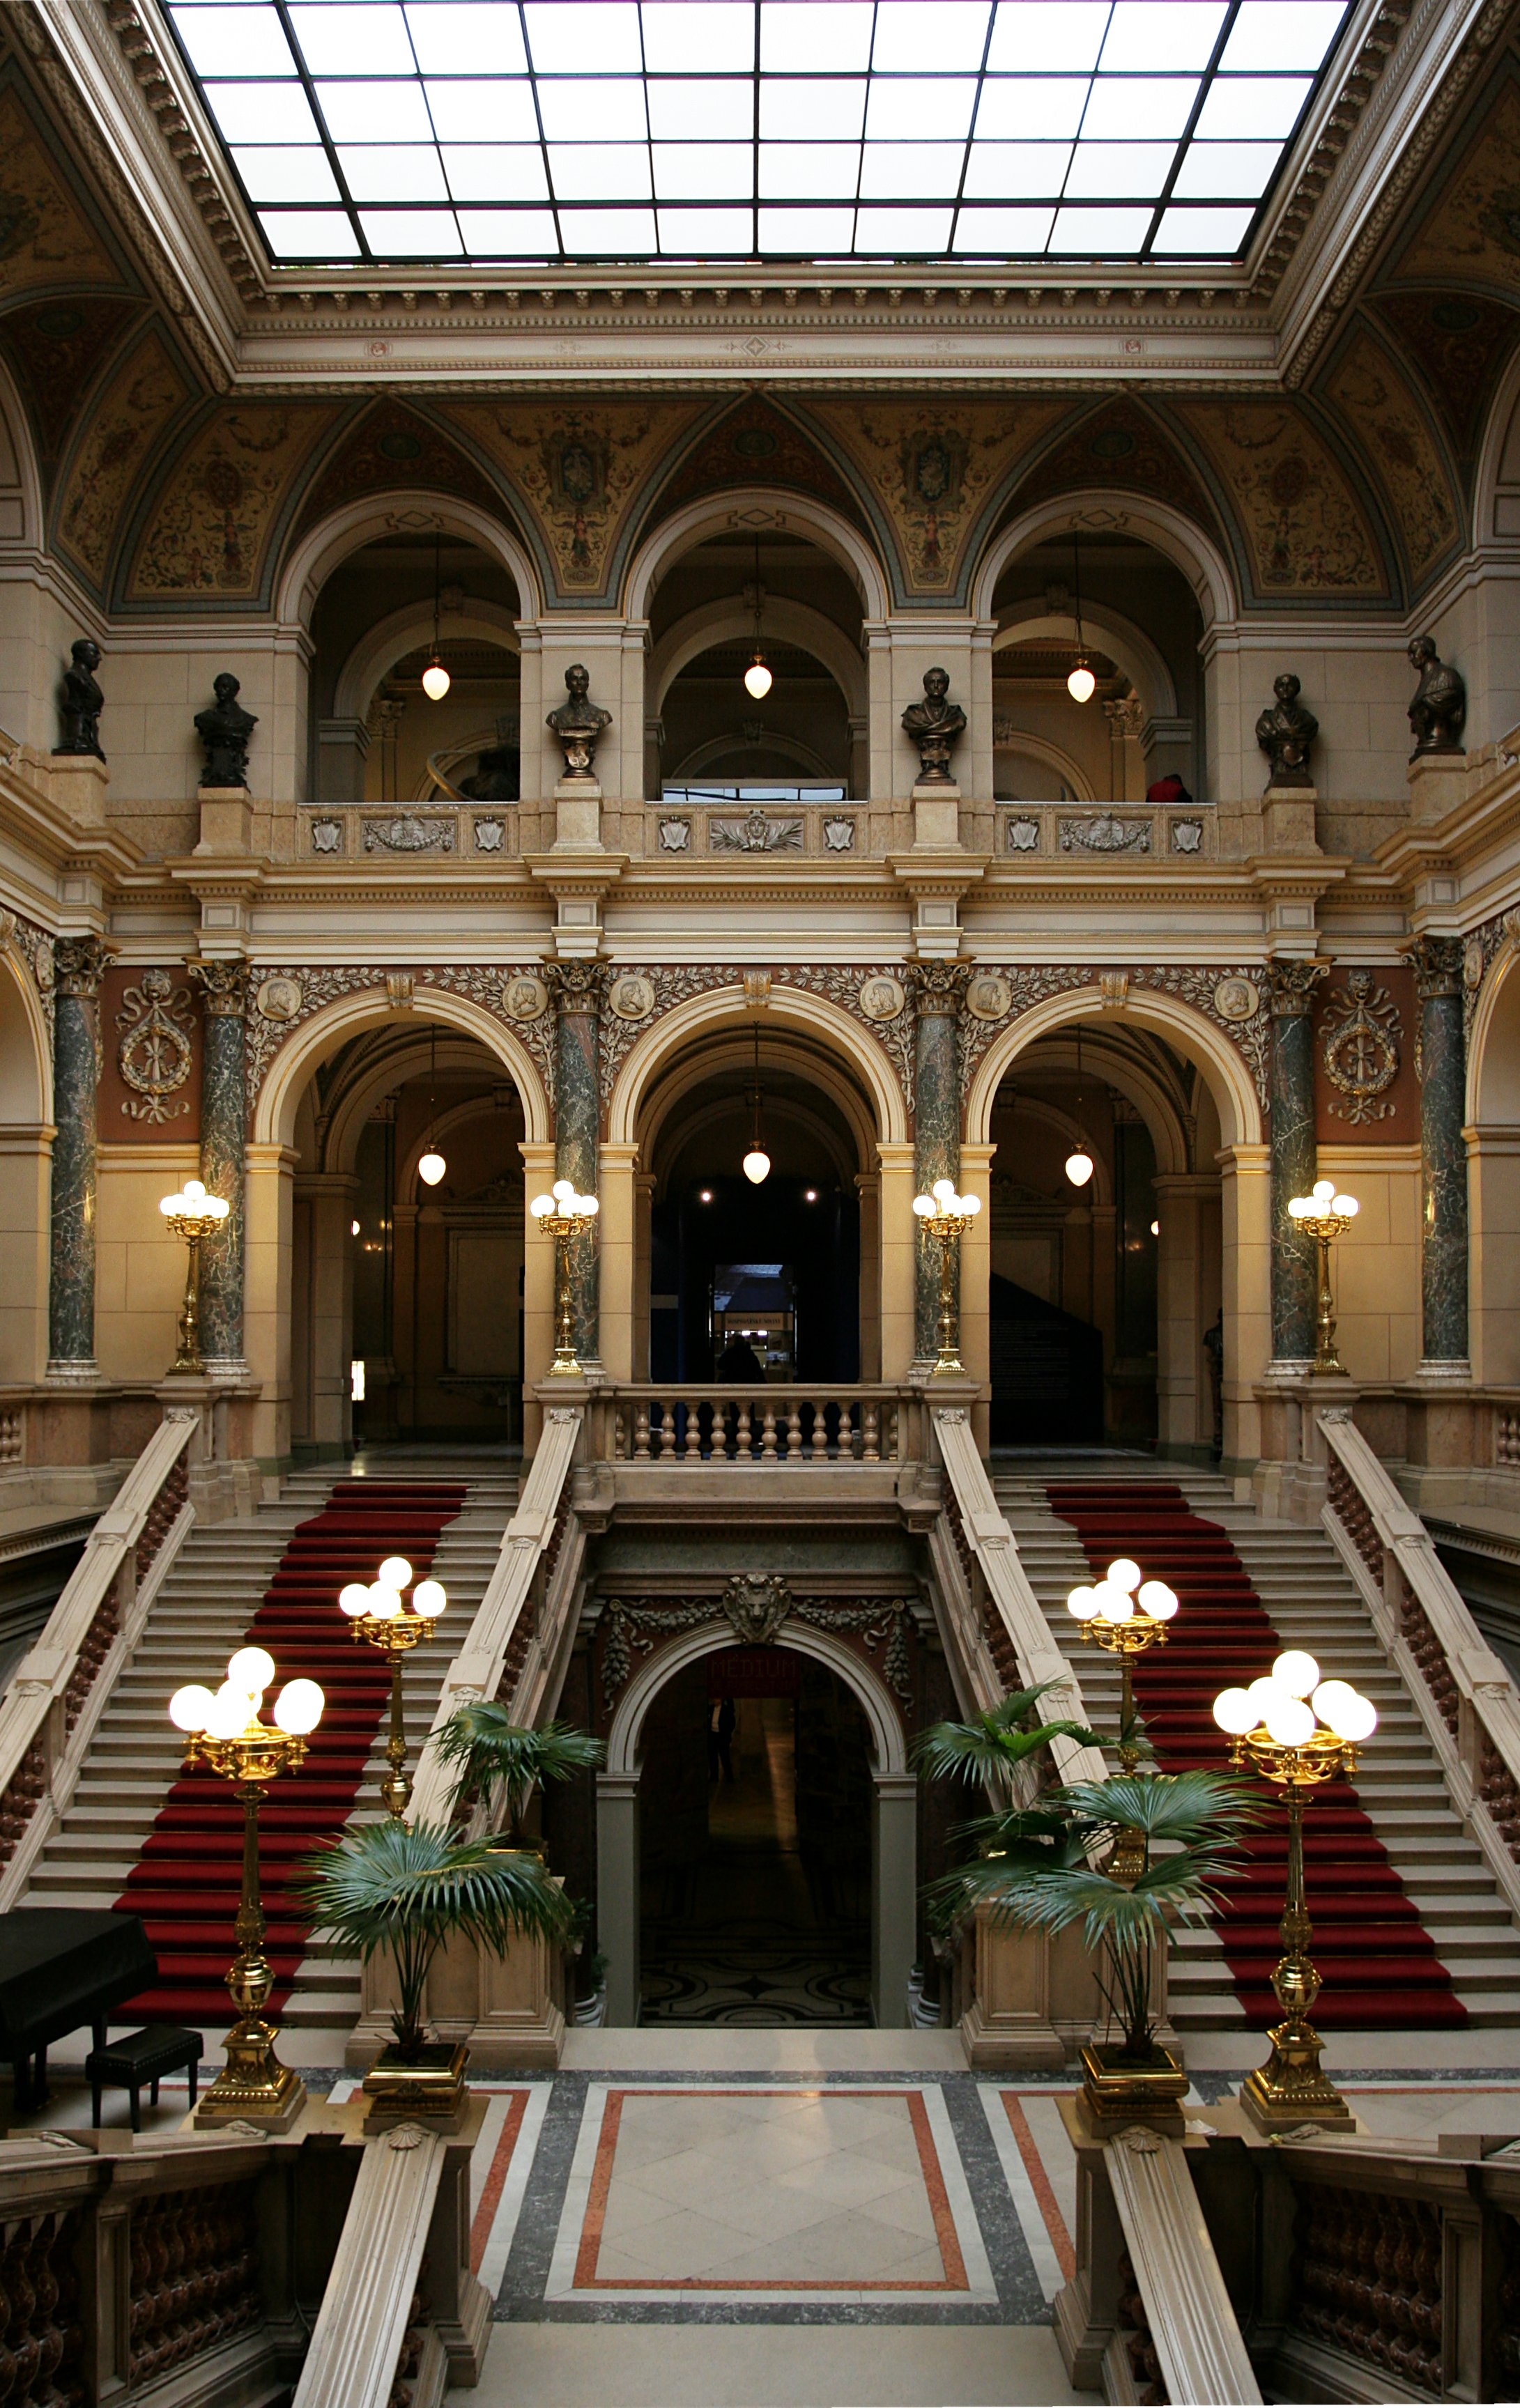 Narodni muzeum interior.jpg